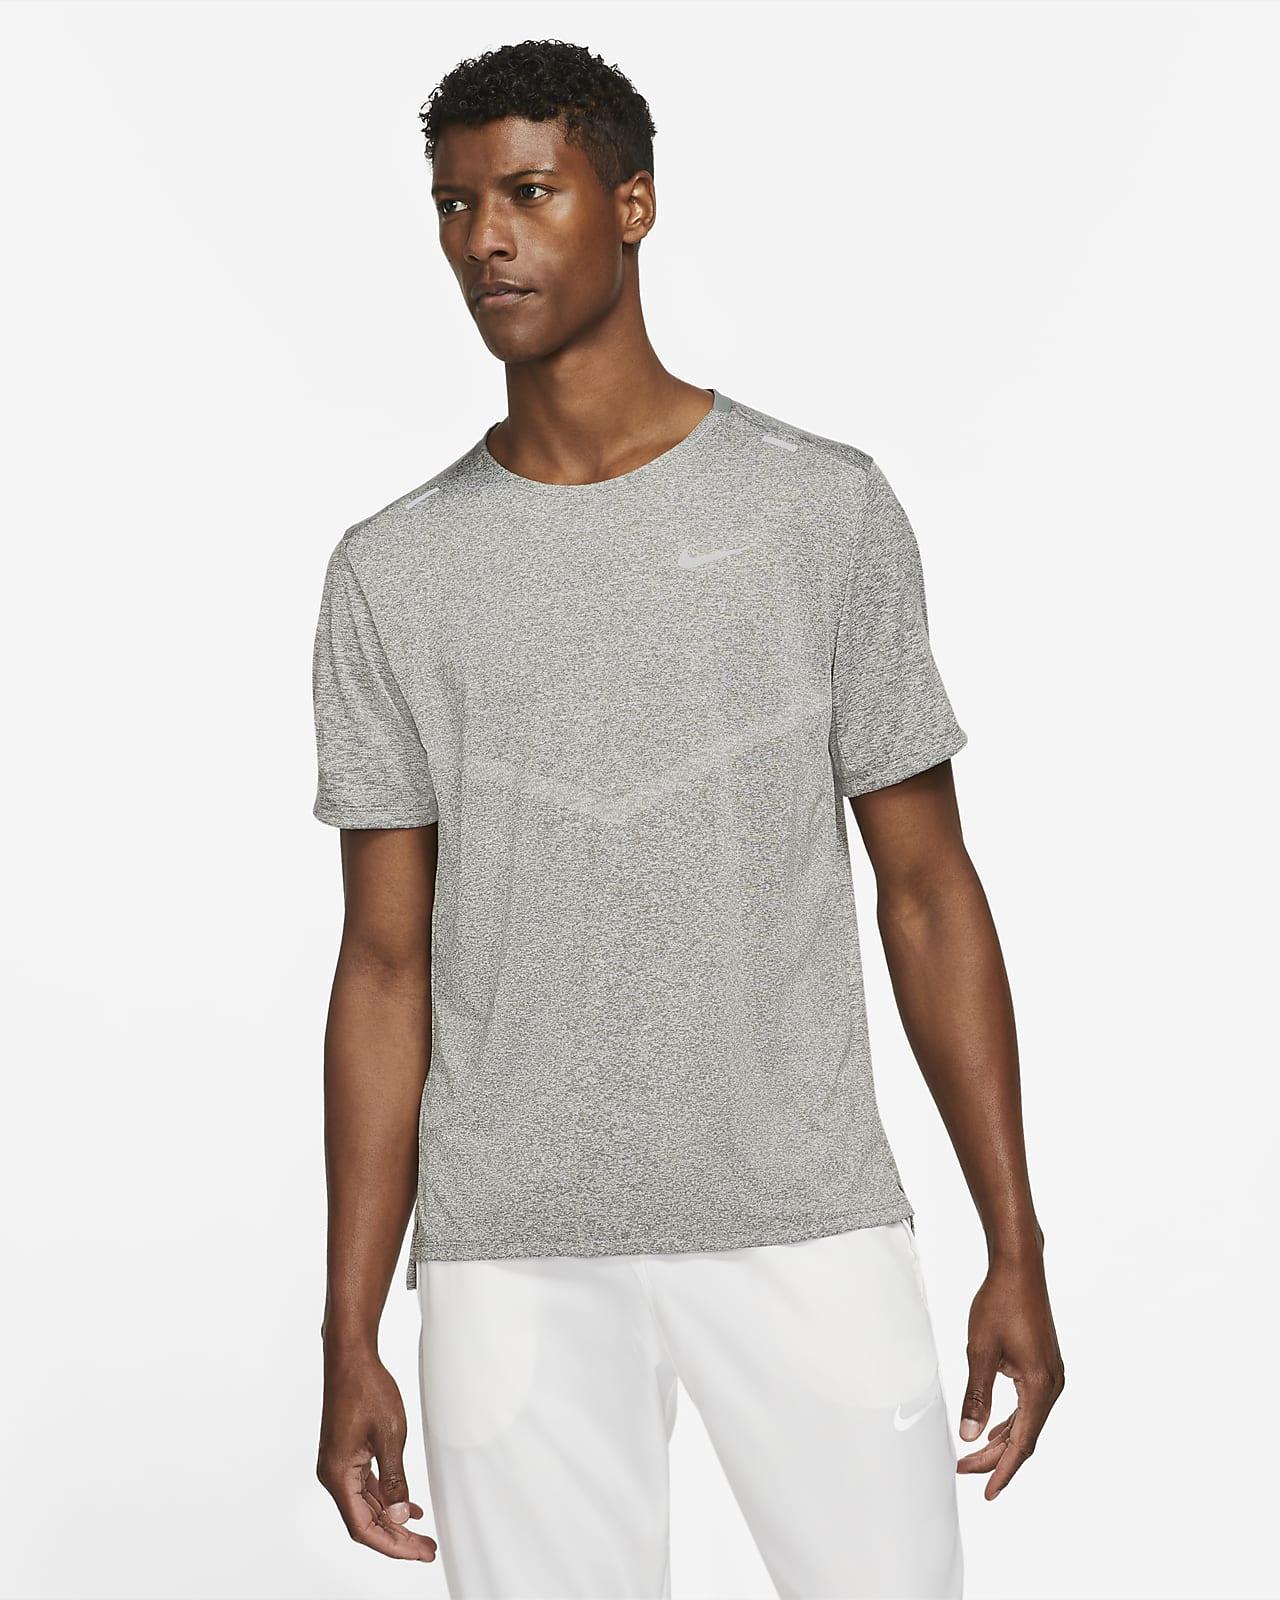 Мужская беговая футболка с коротким рукавом Nike Dri-FIT Rise 365